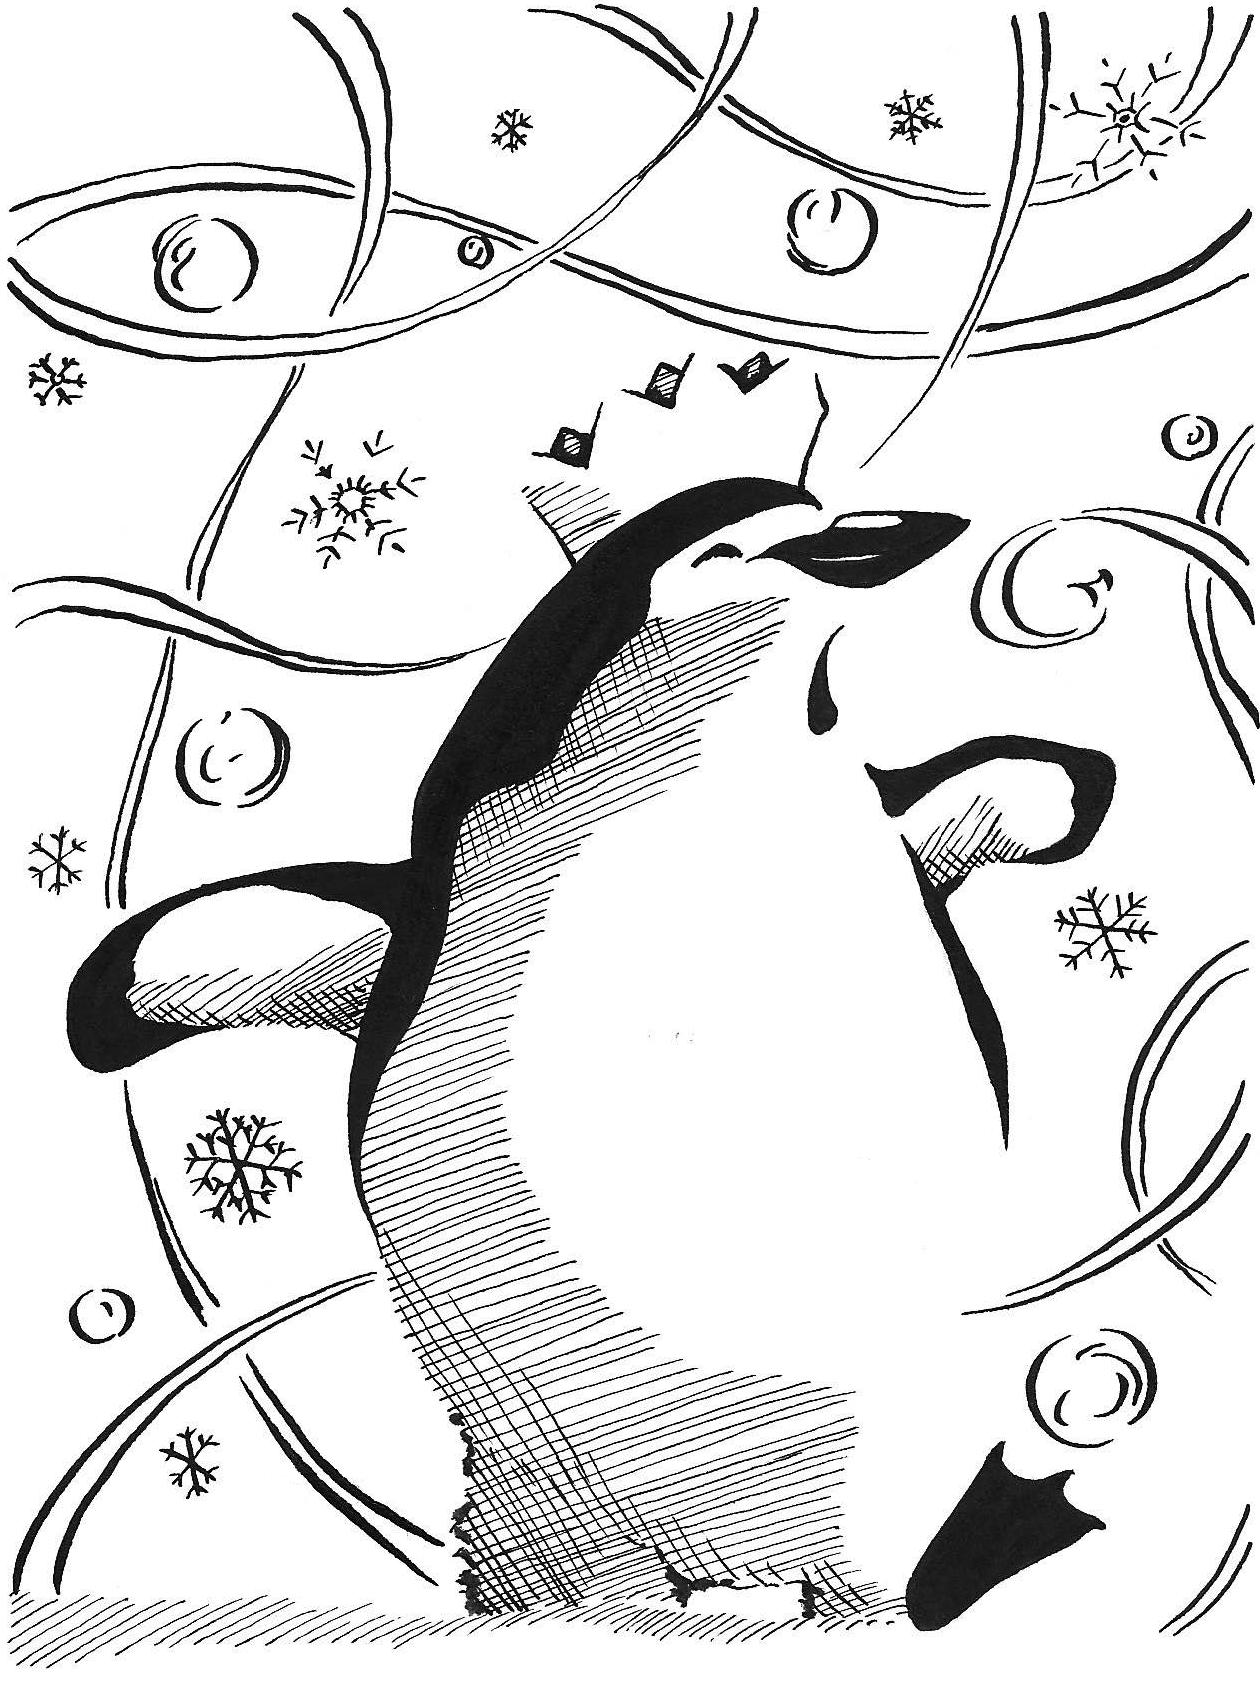 Inked penguin